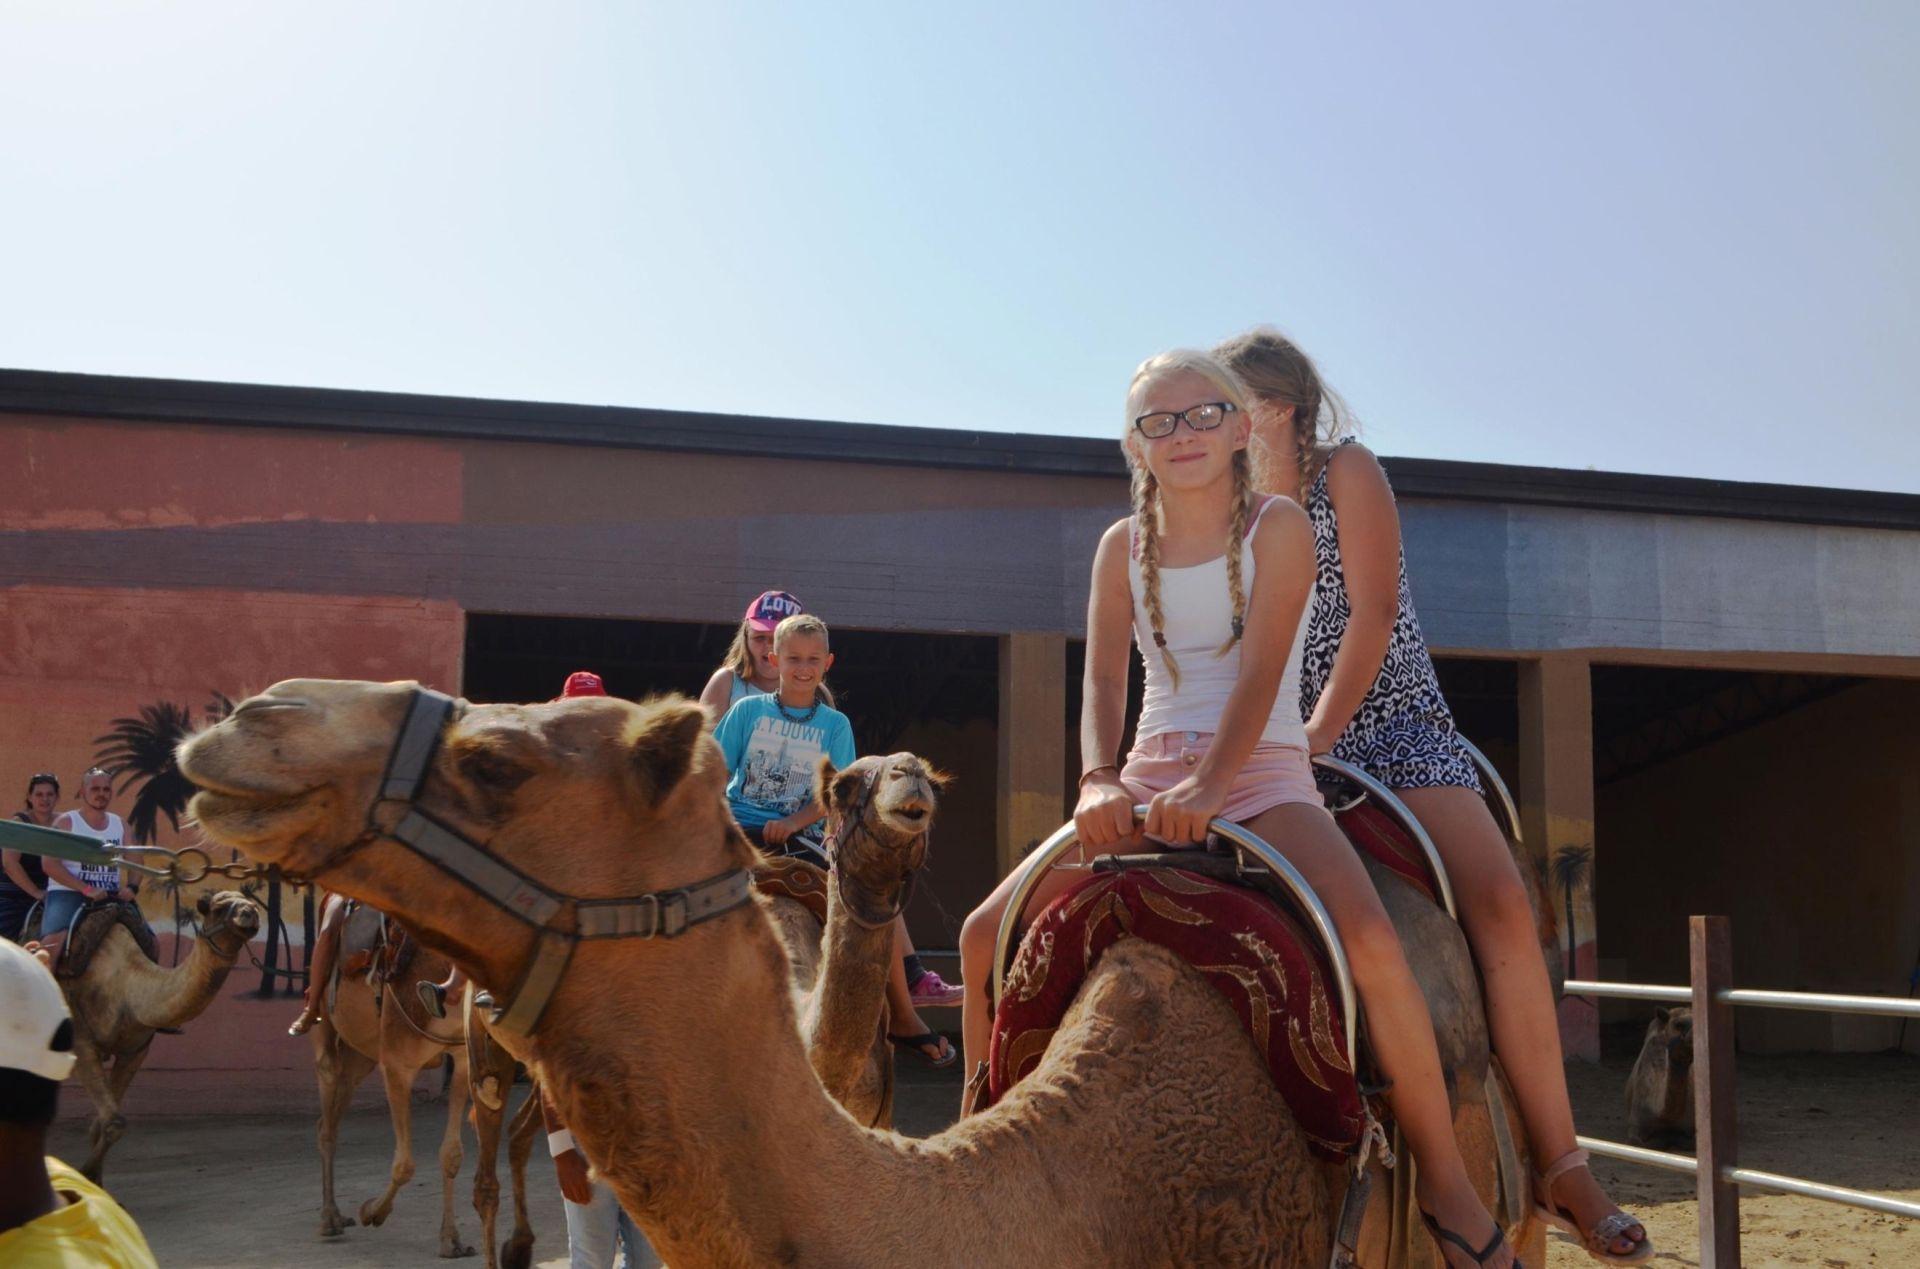 Fotos: Deutsche Kinderhilfsstiftung e.V.